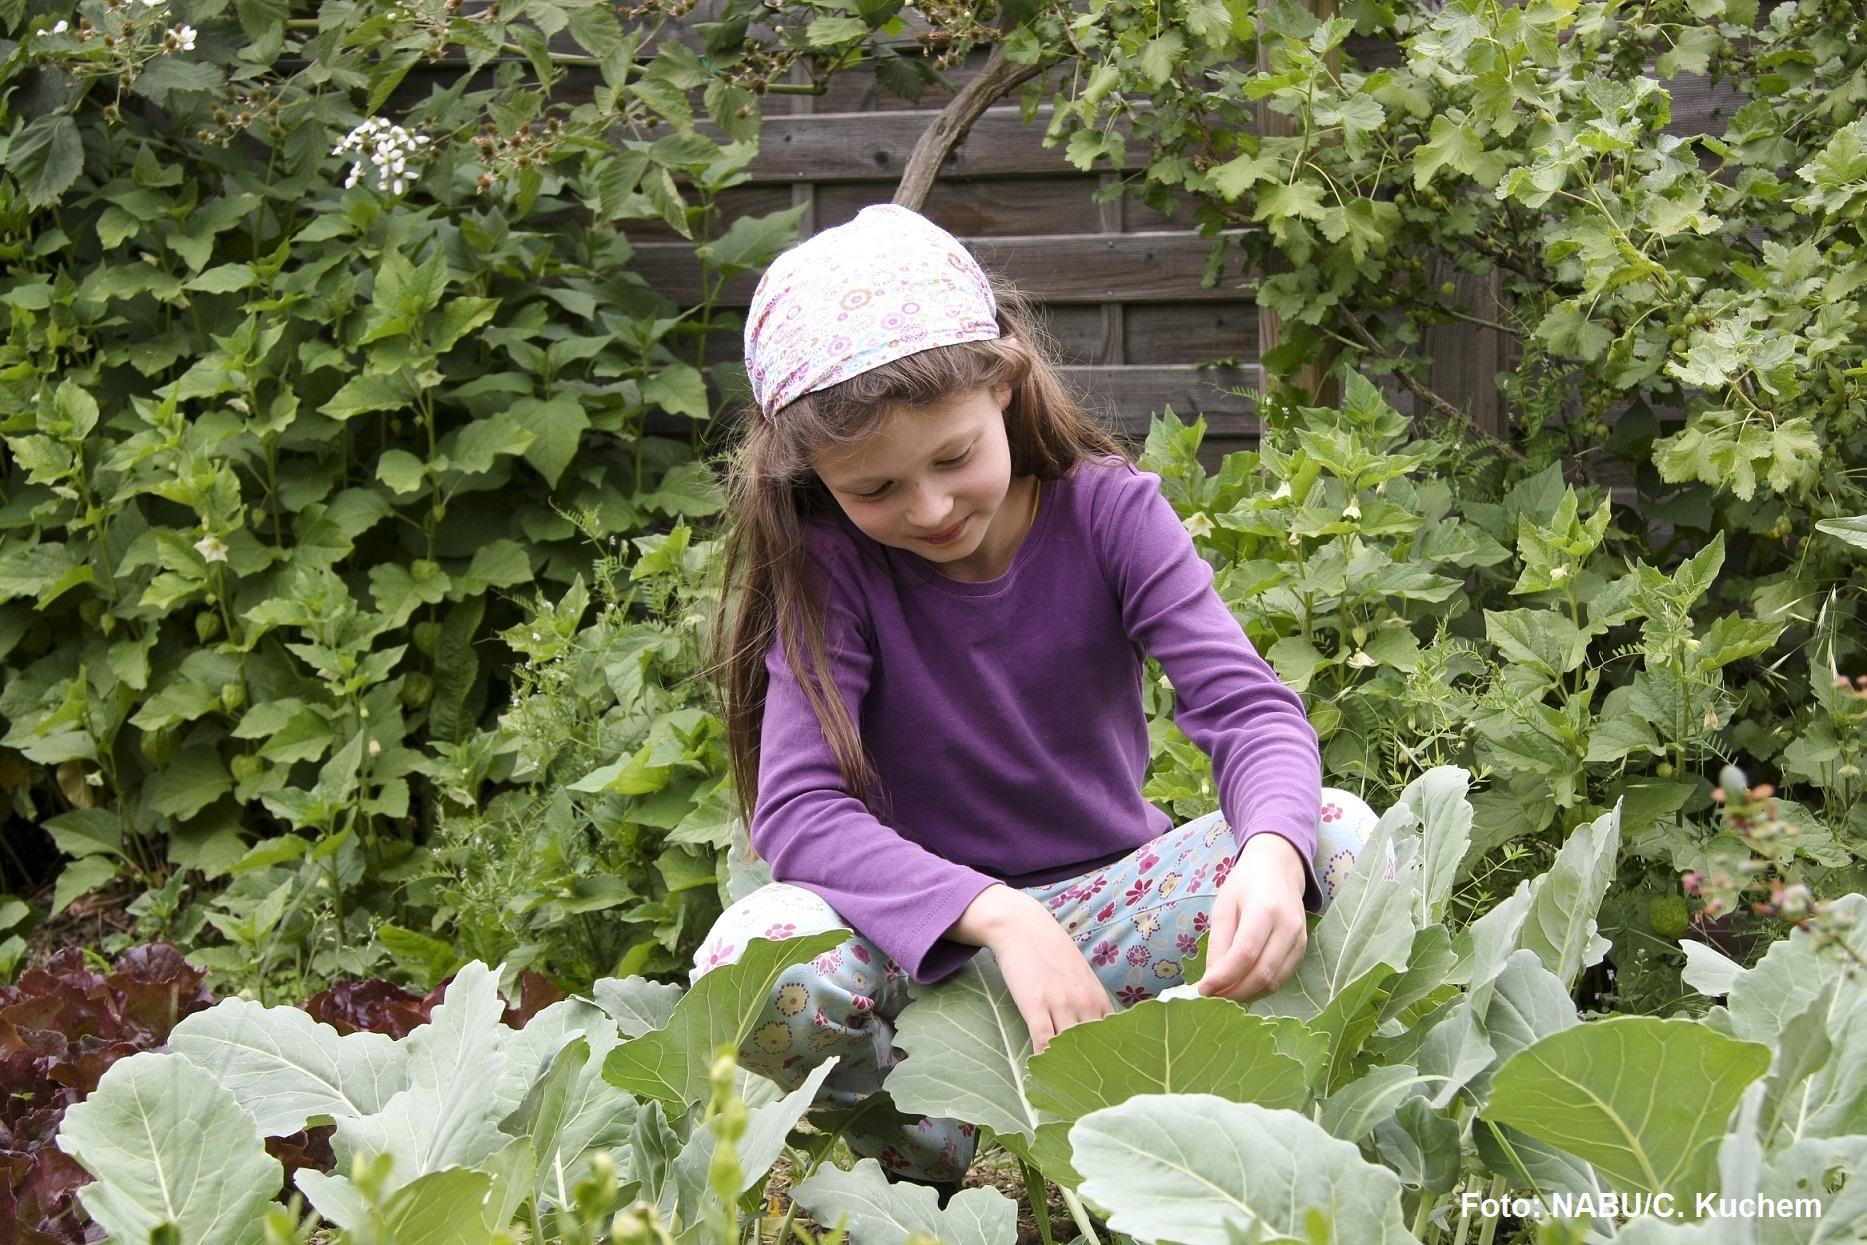 Kind hockt im Gemüsegarten